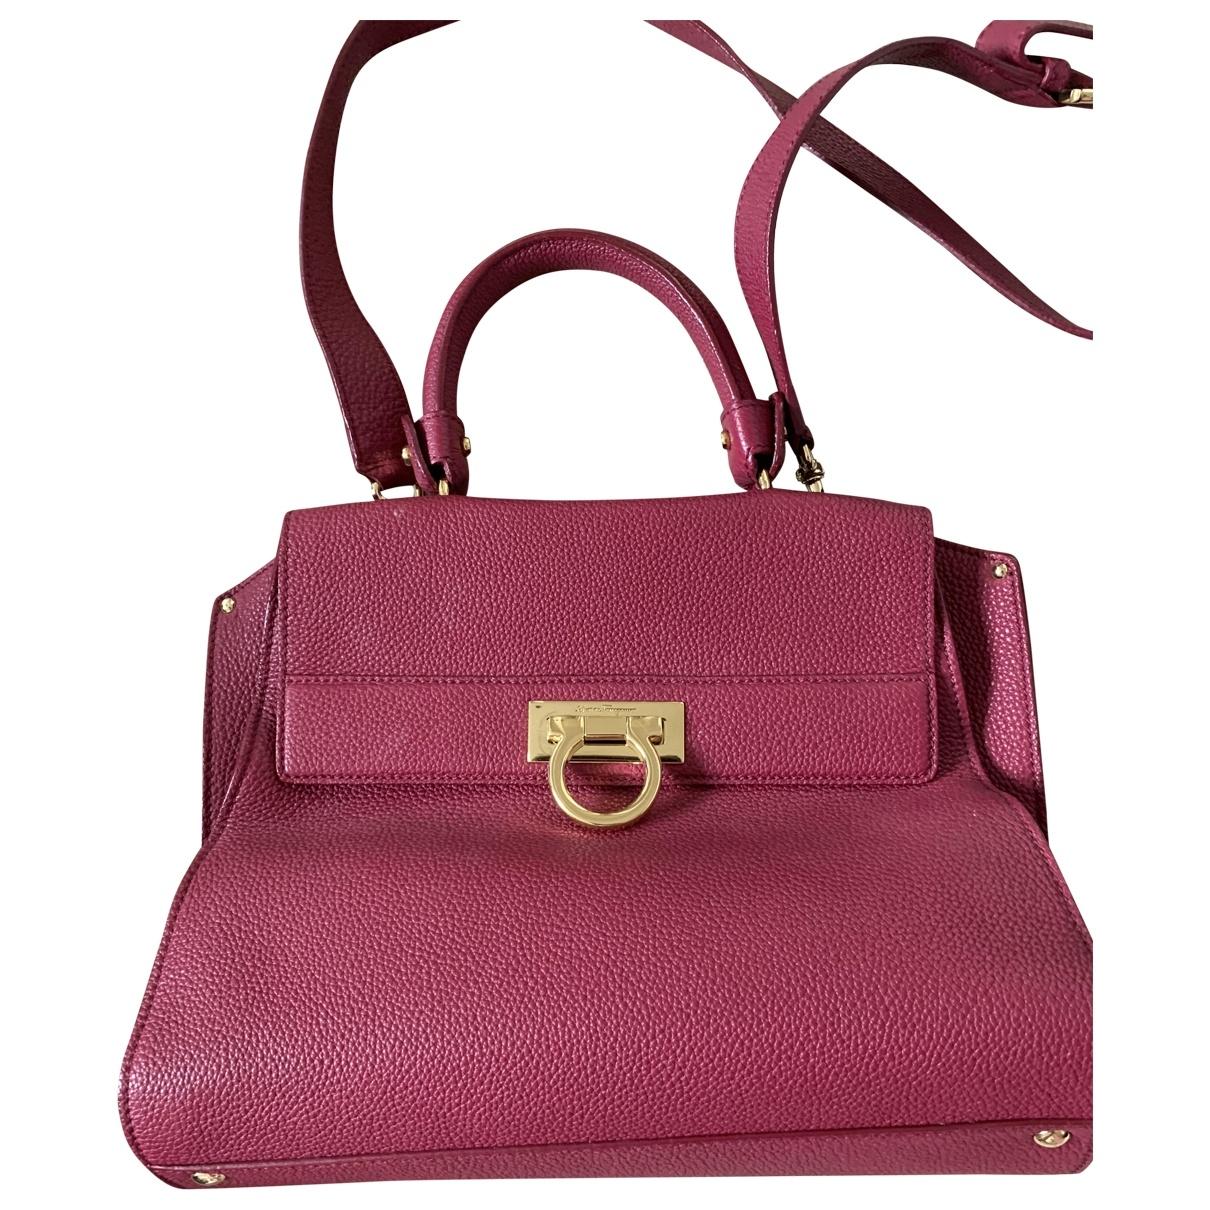 Salvatore Ferragamo \N Handtasche in  Lila Leder